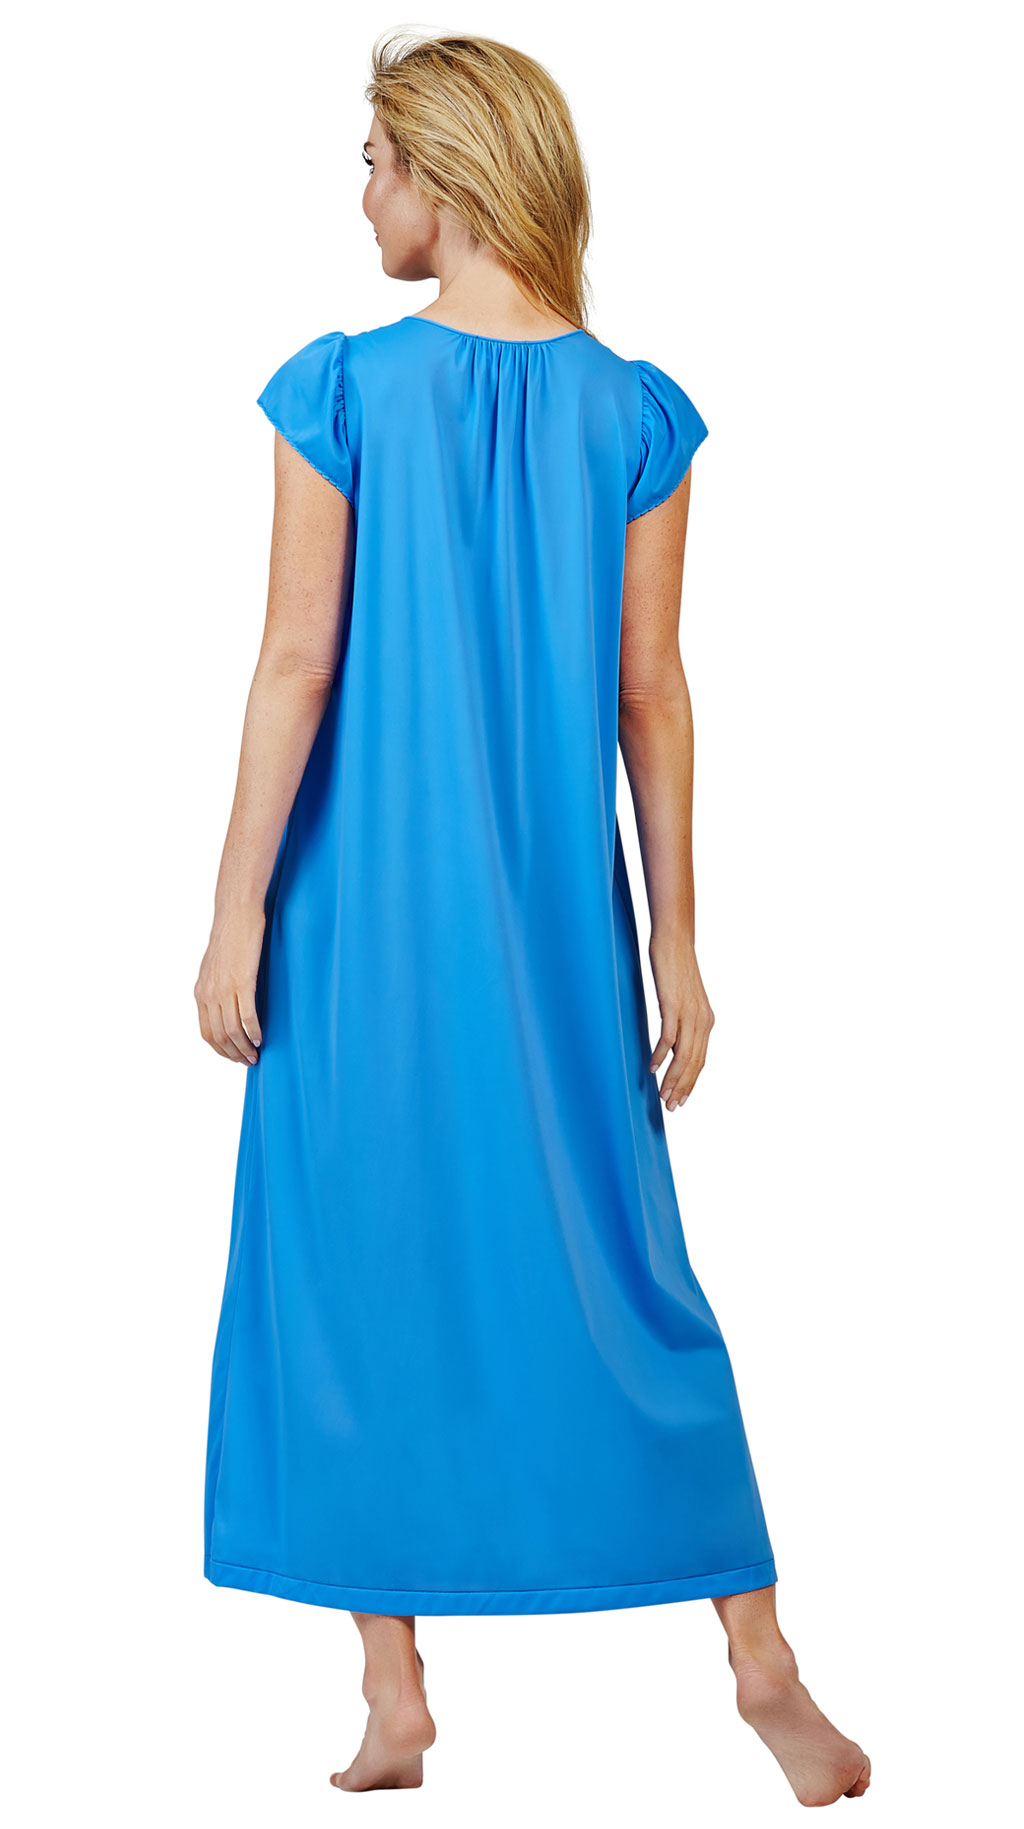 rosebud night gowns from shadowline